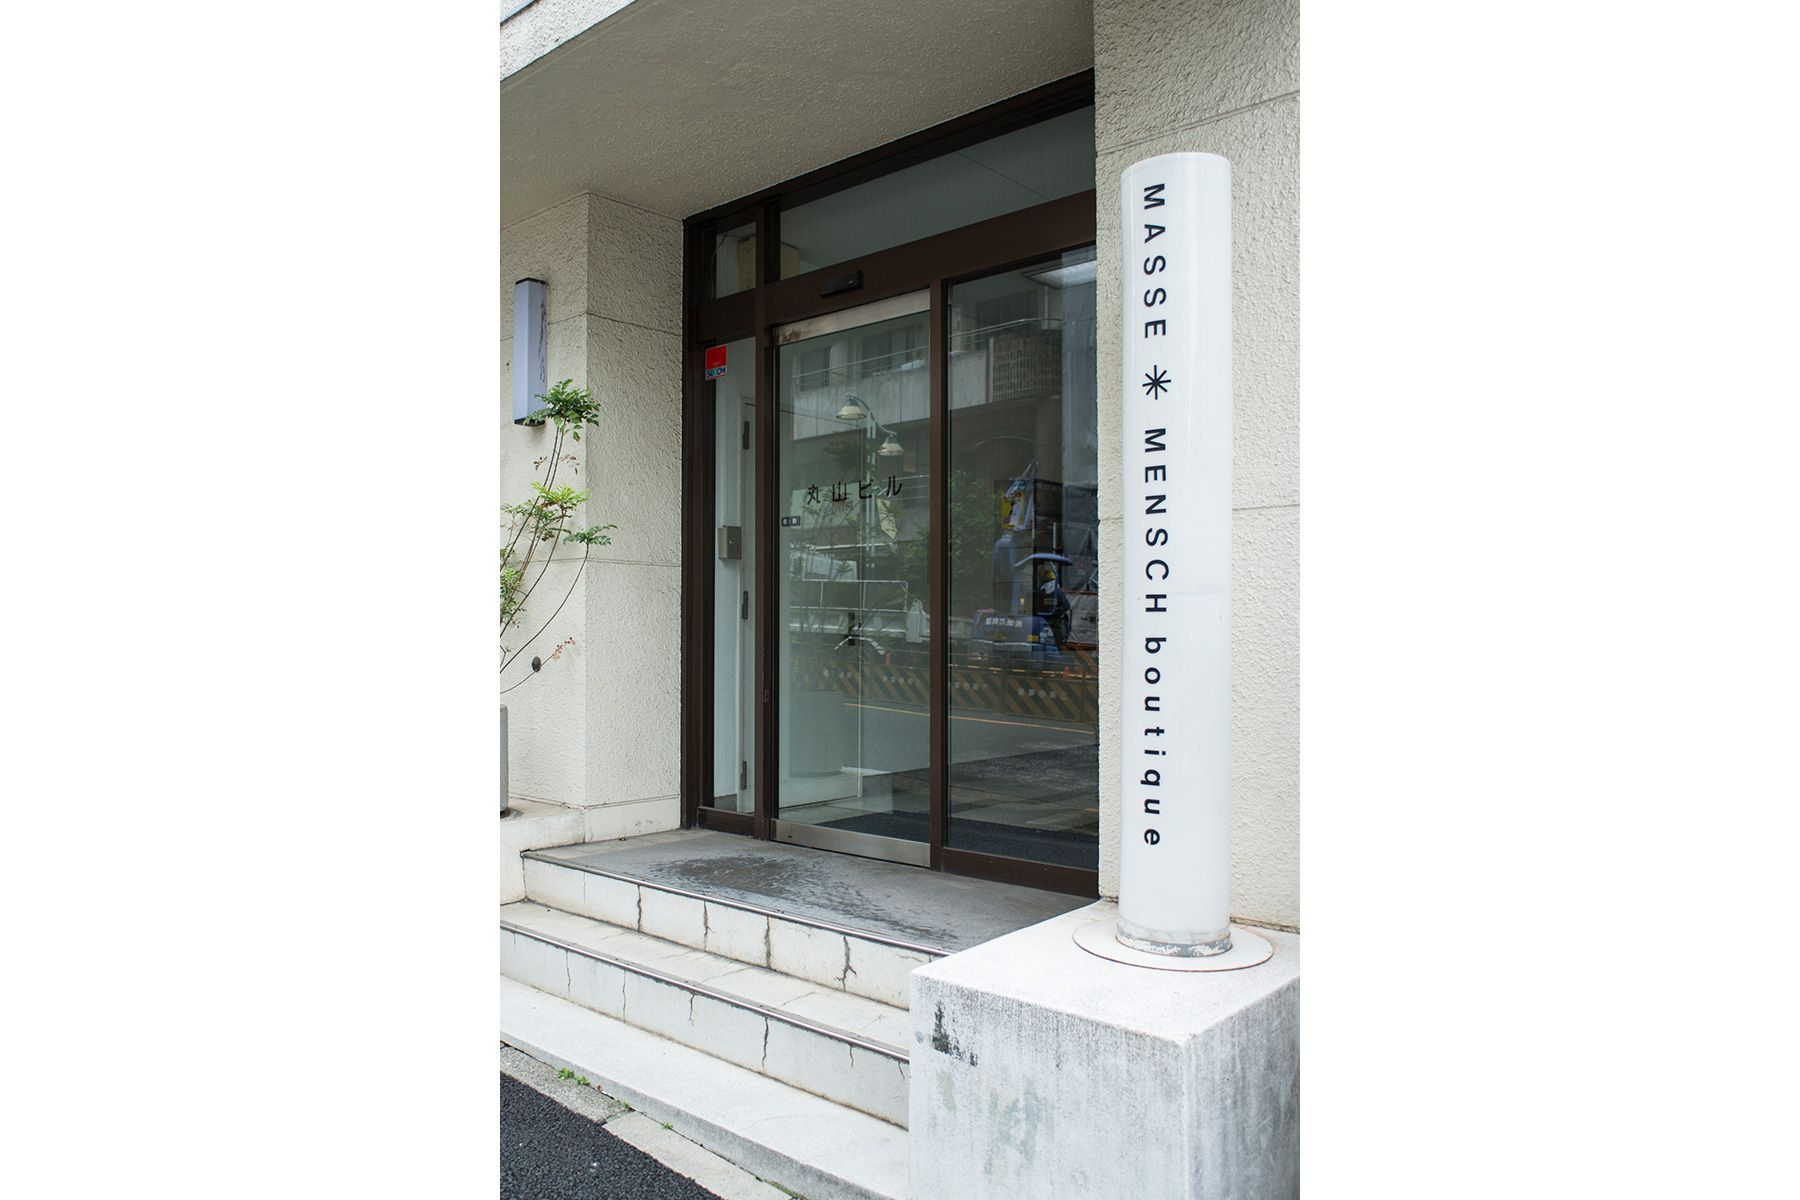 GOSARO EBISU(ゴサロ エビス)家庭料理のケータリングJicca(ジッカ